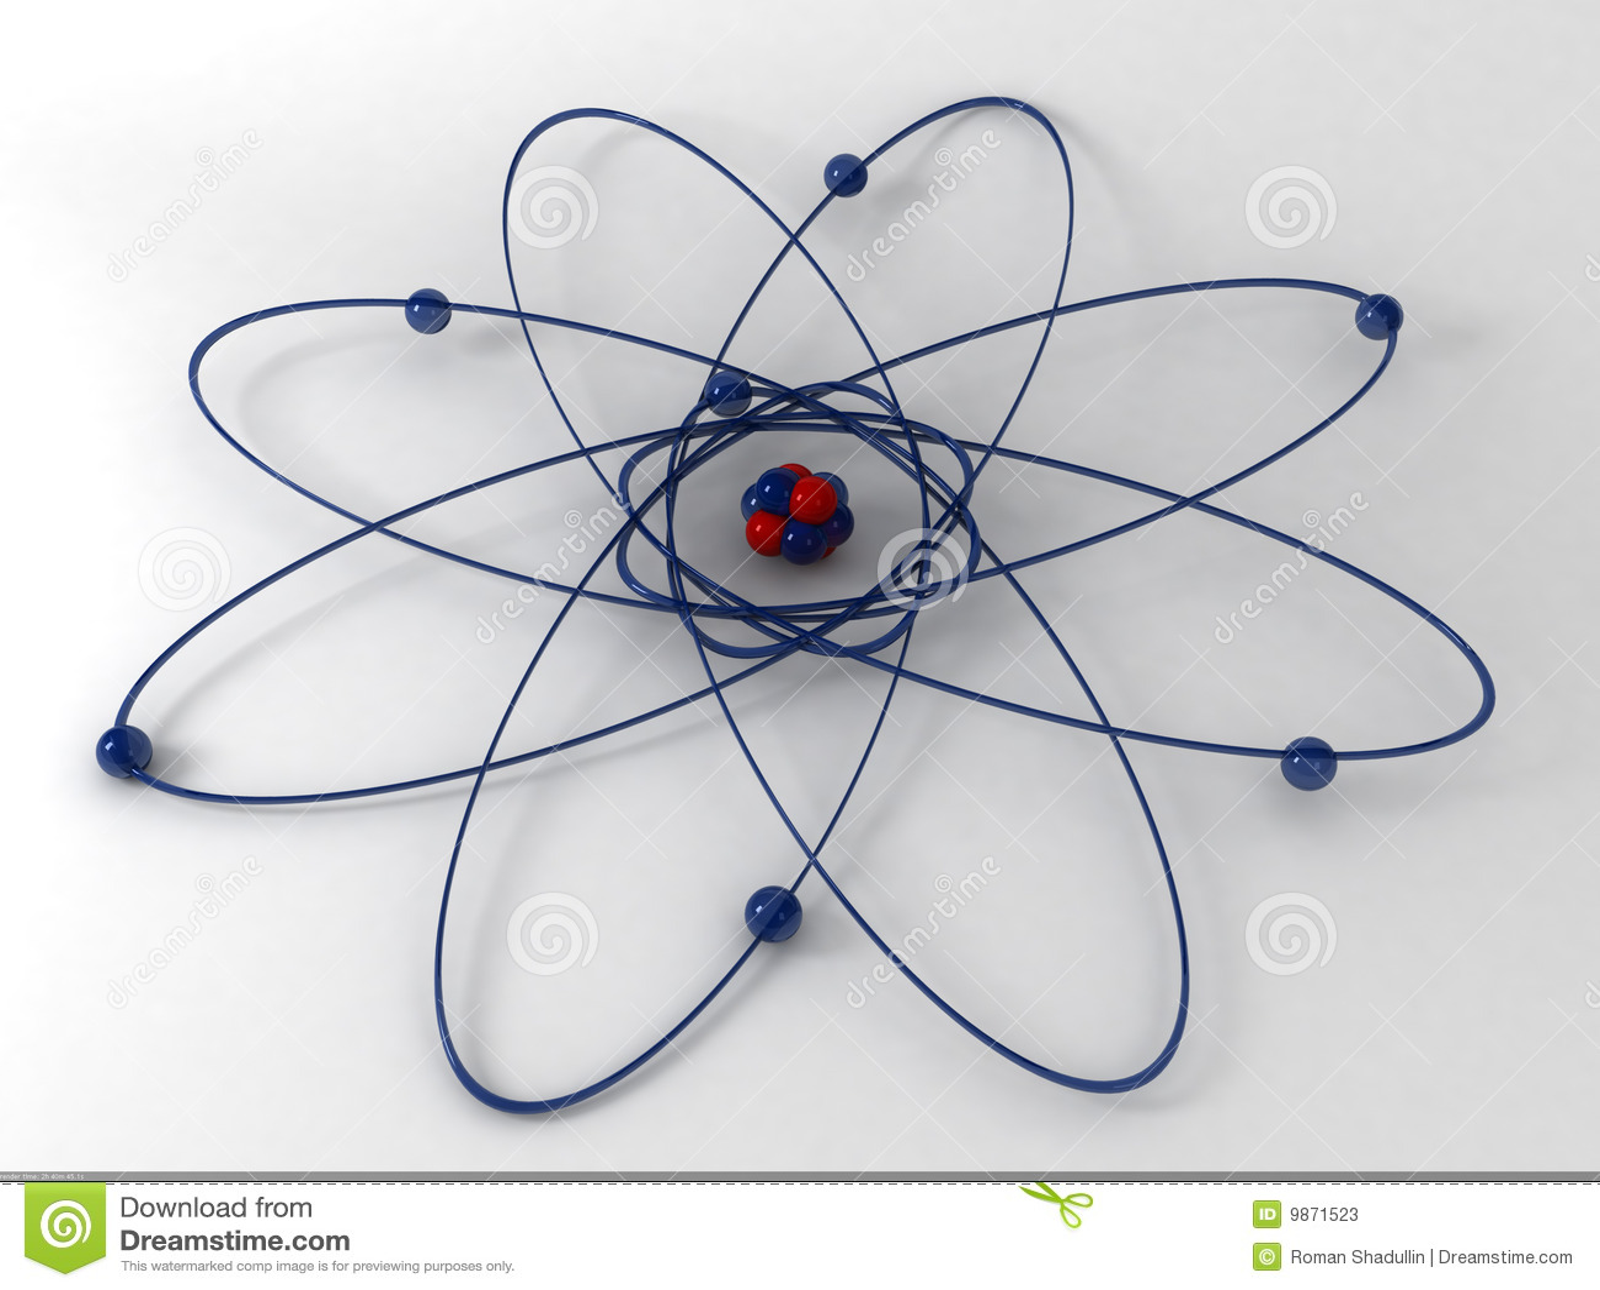 Molecule 3d stock illustration illustration of metal 9871523 molecule 3d ccuart Choice Image